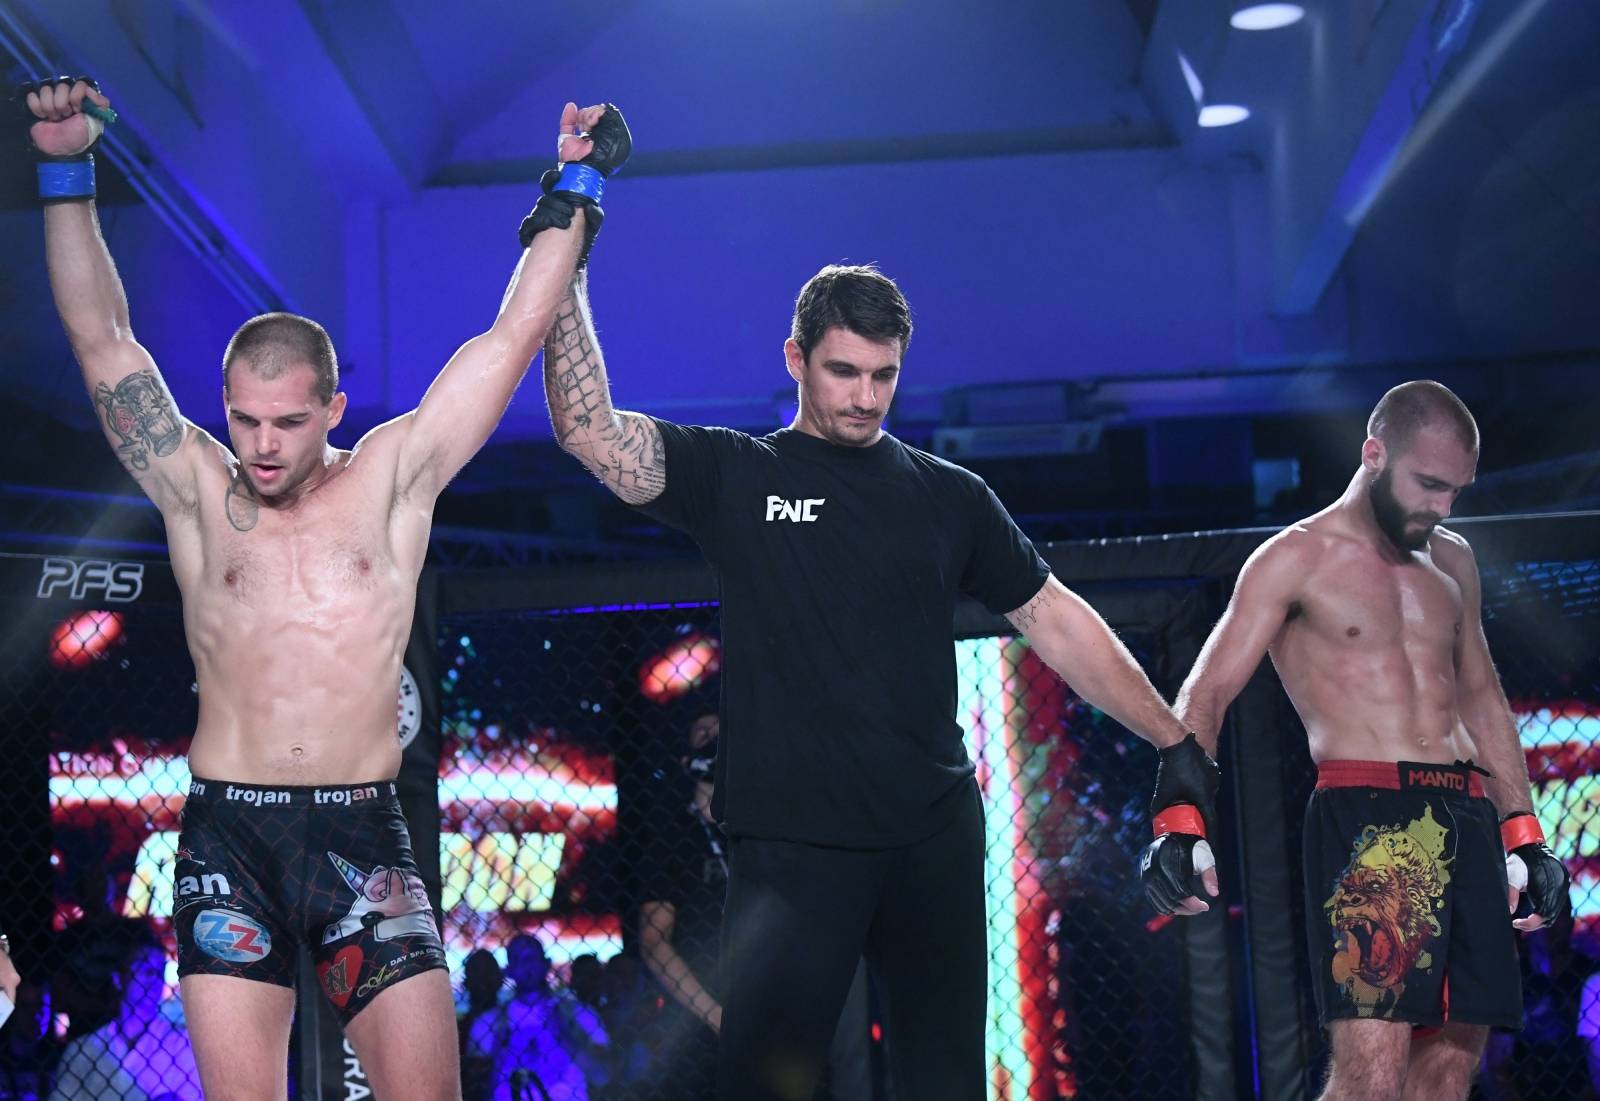 Zagreb: Armagedon turnir MMA borbi, Daniel Bažant - Nino Škrijelj